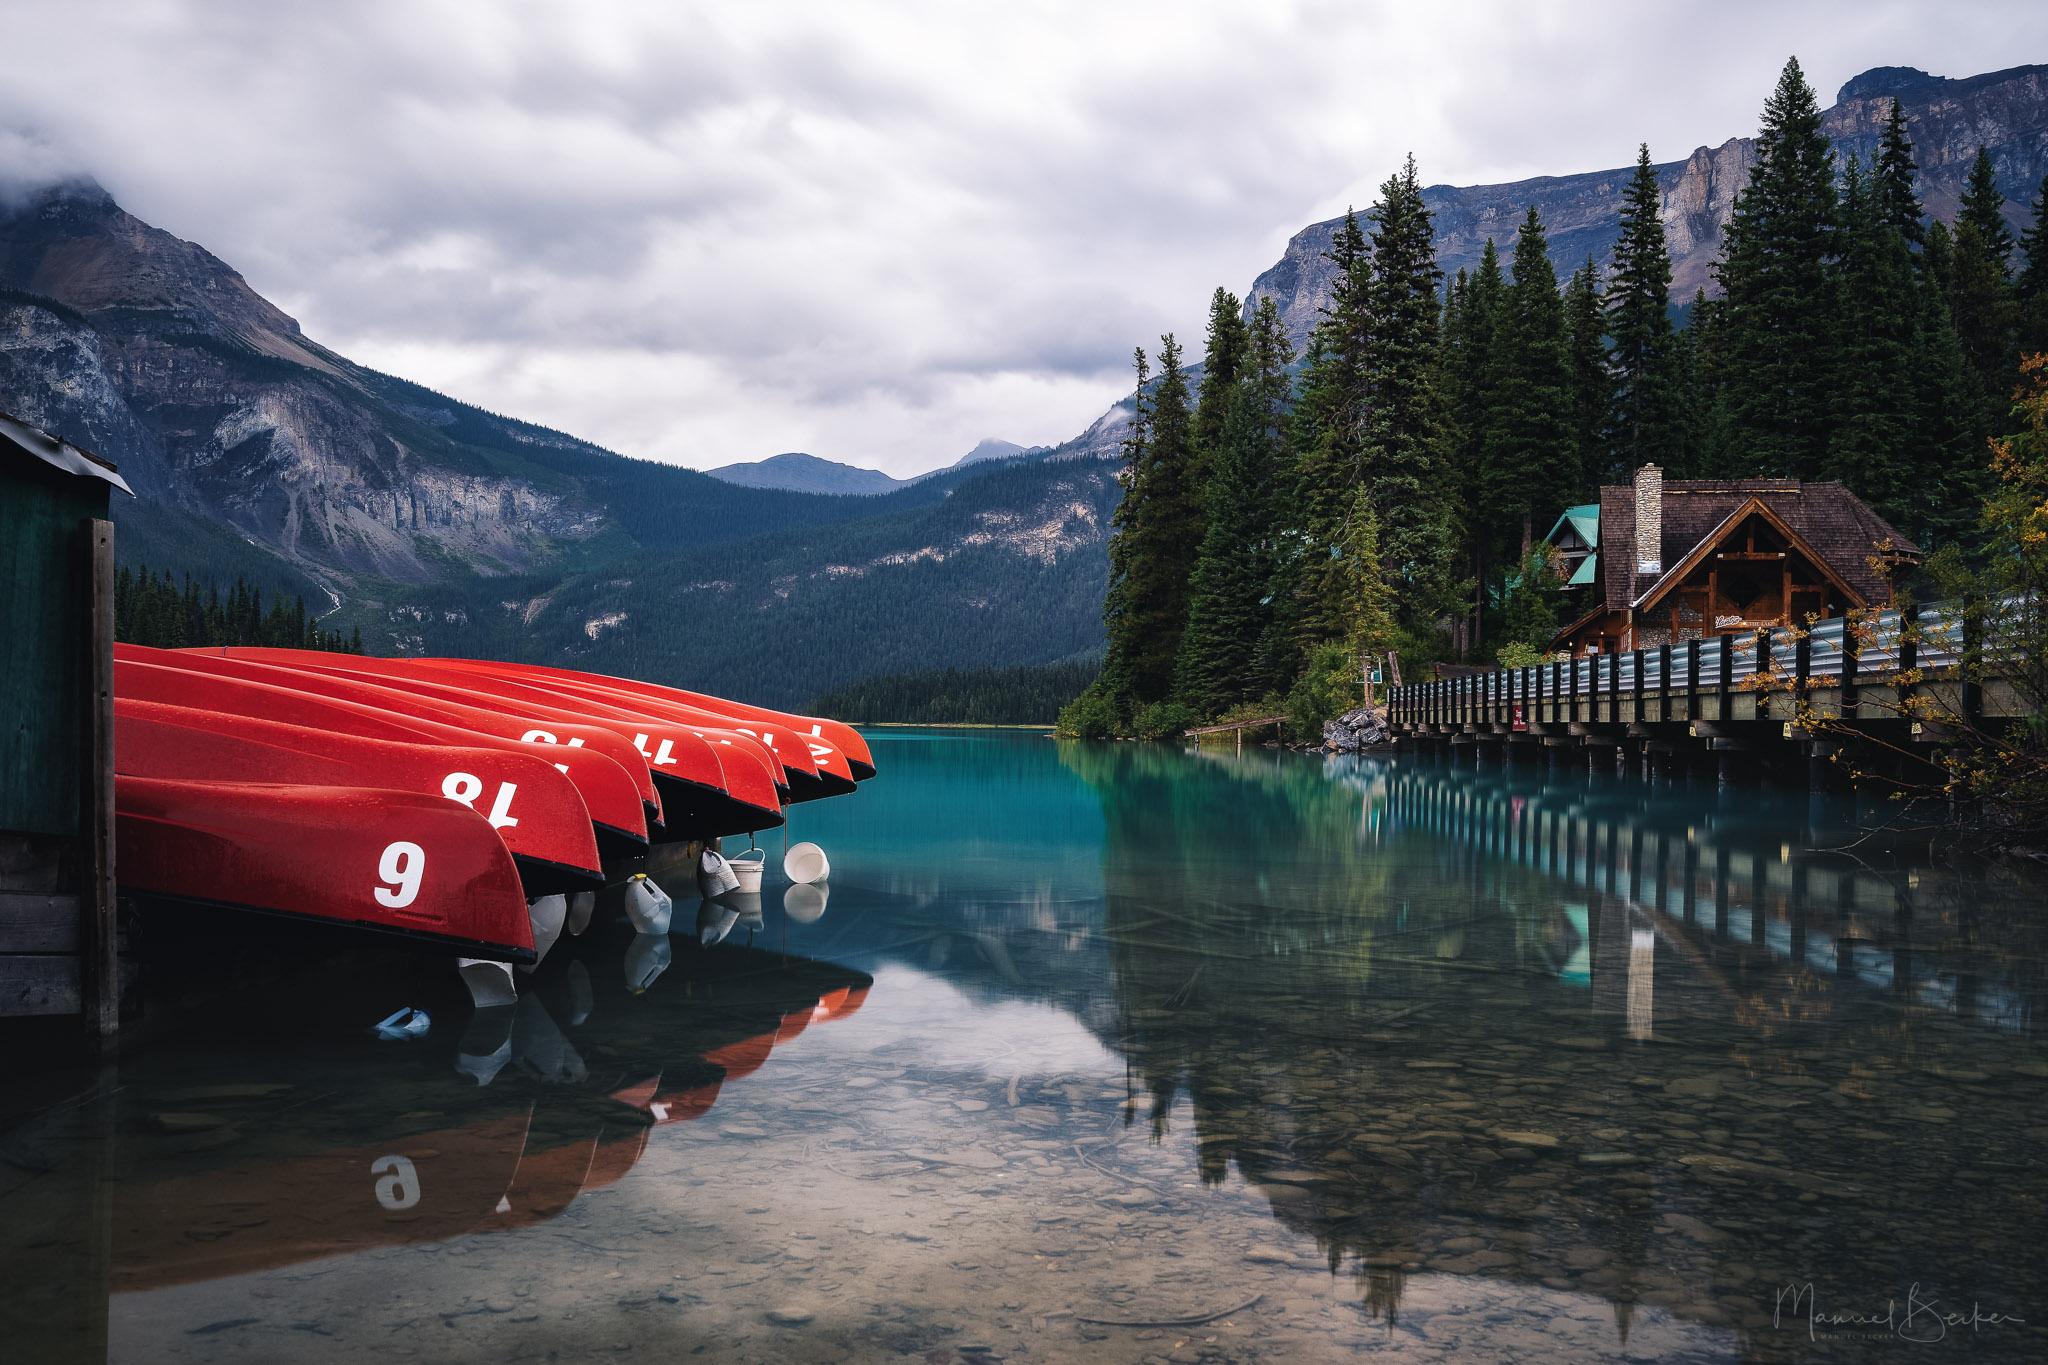 Canoe View at Emerald Lake, Canada